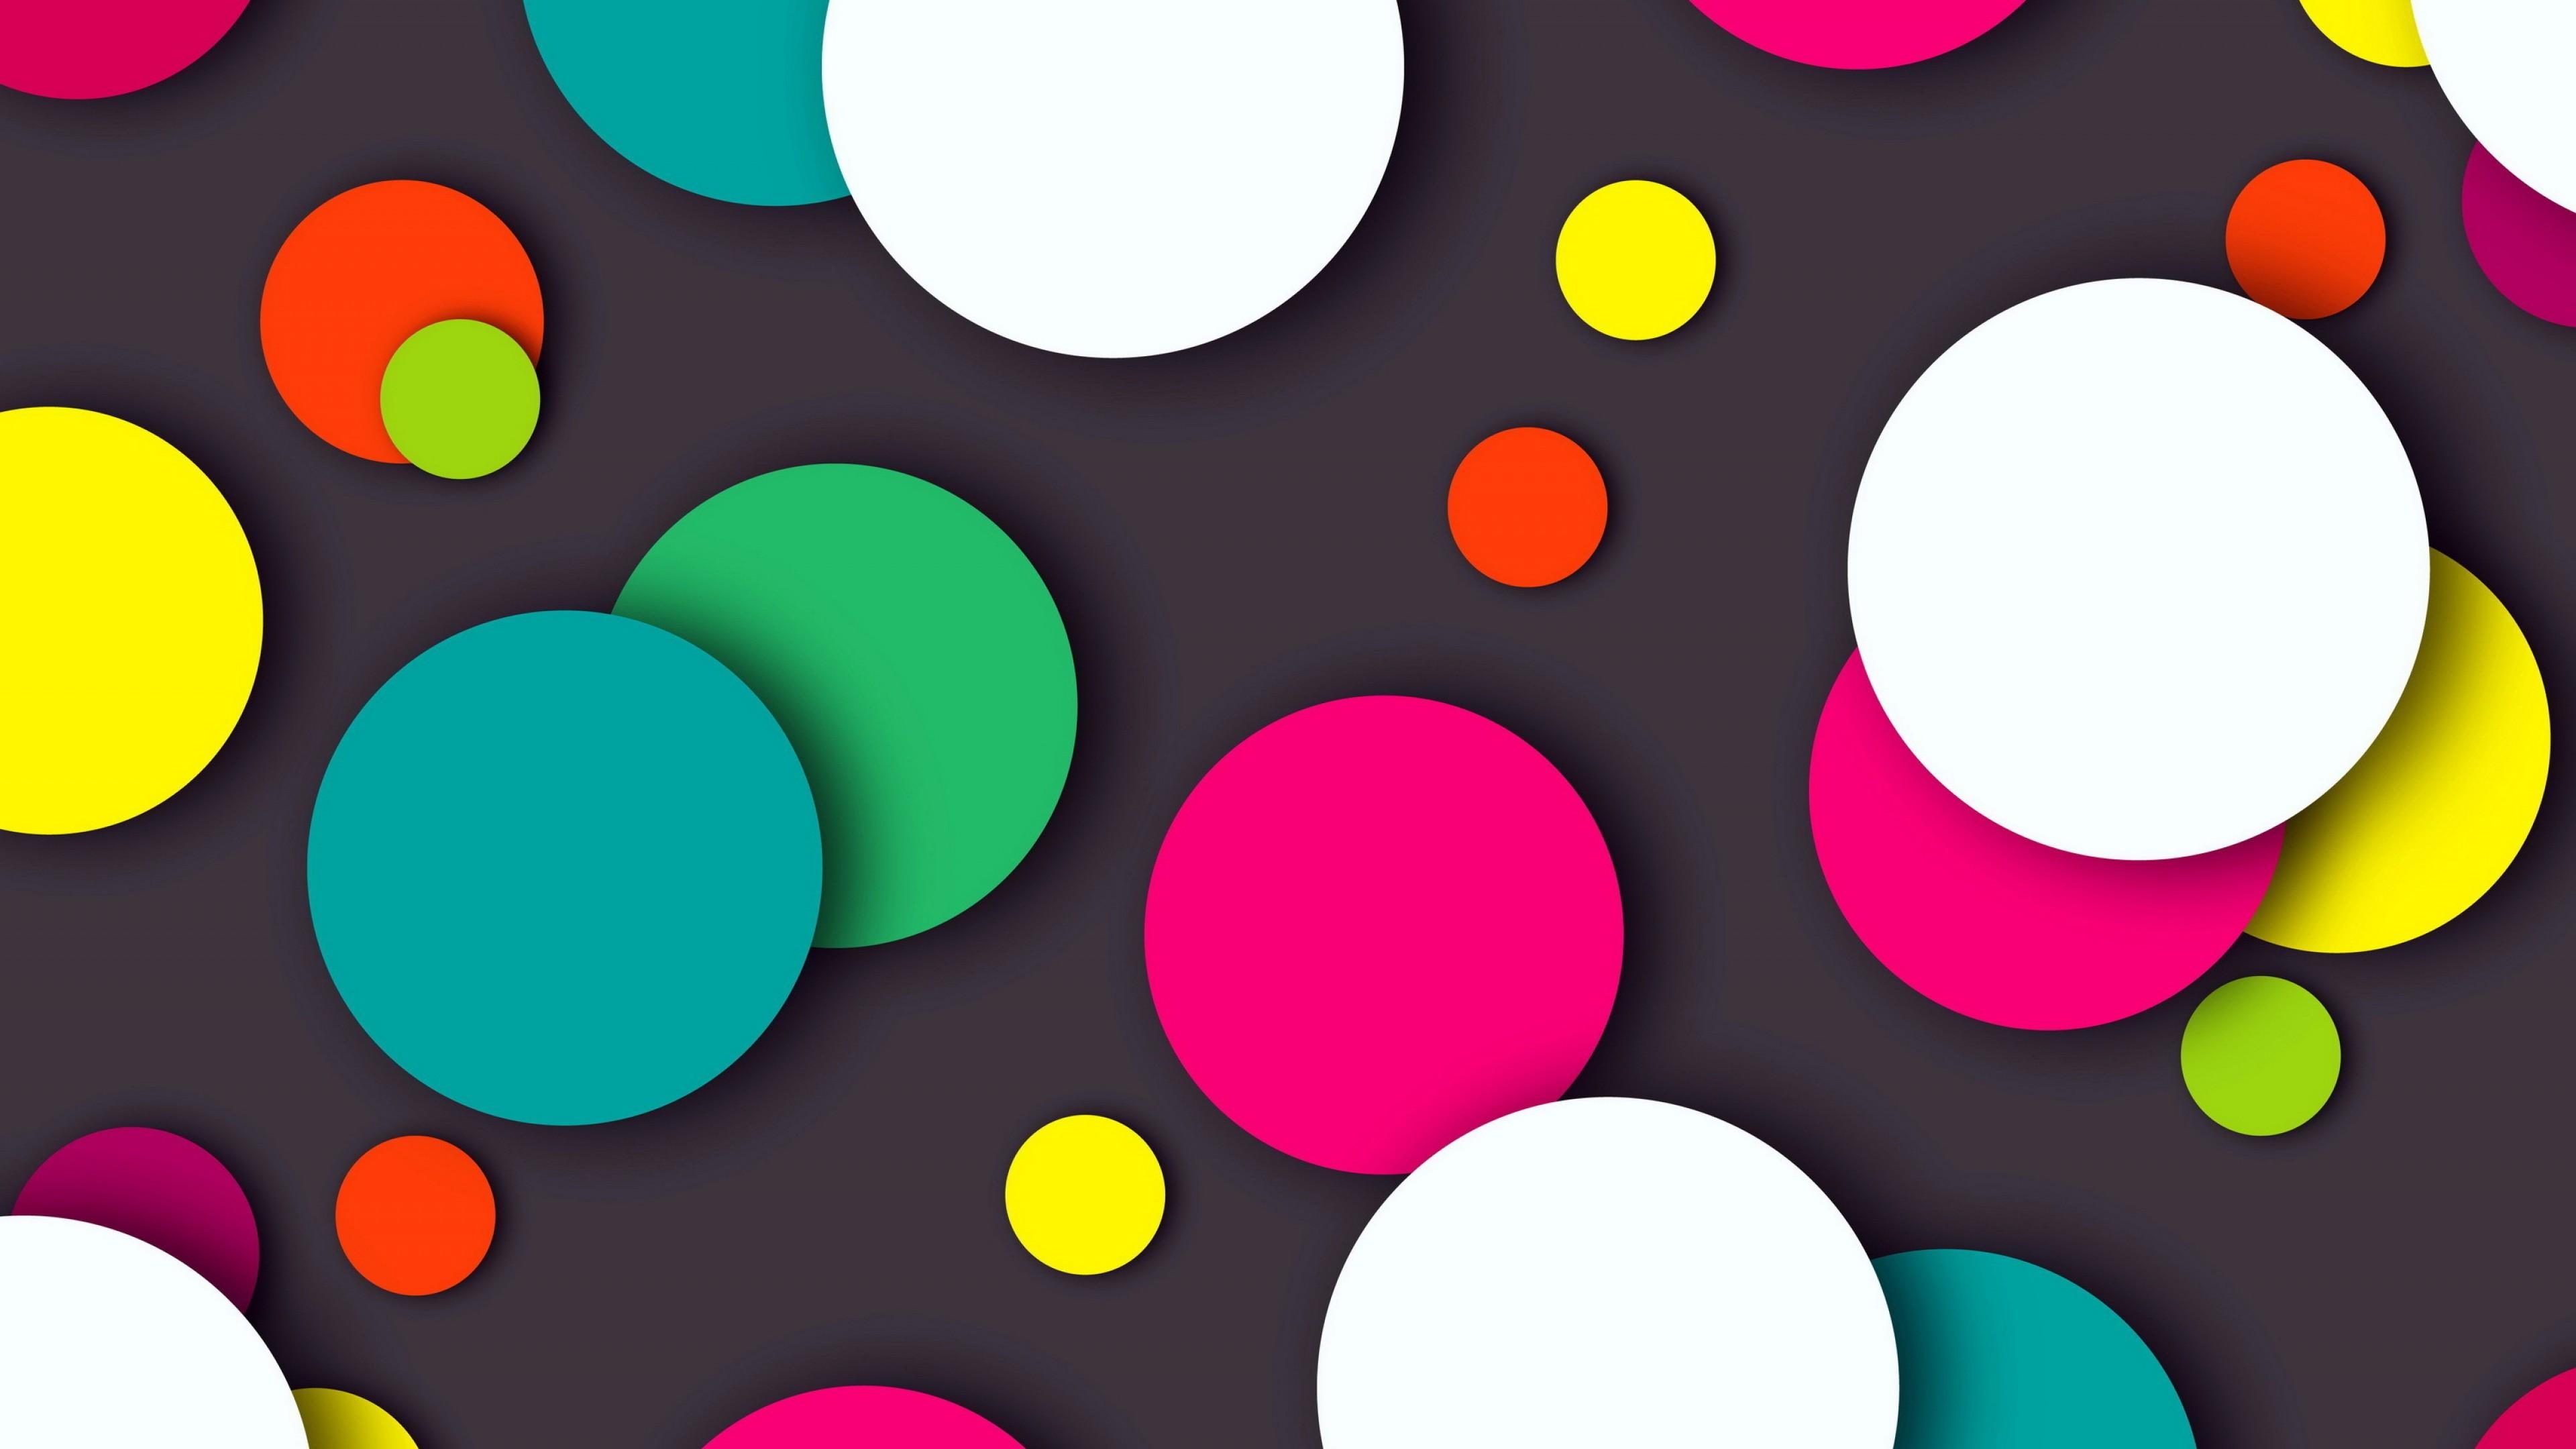 Tags: Colorful Dots, Multicolor, HD